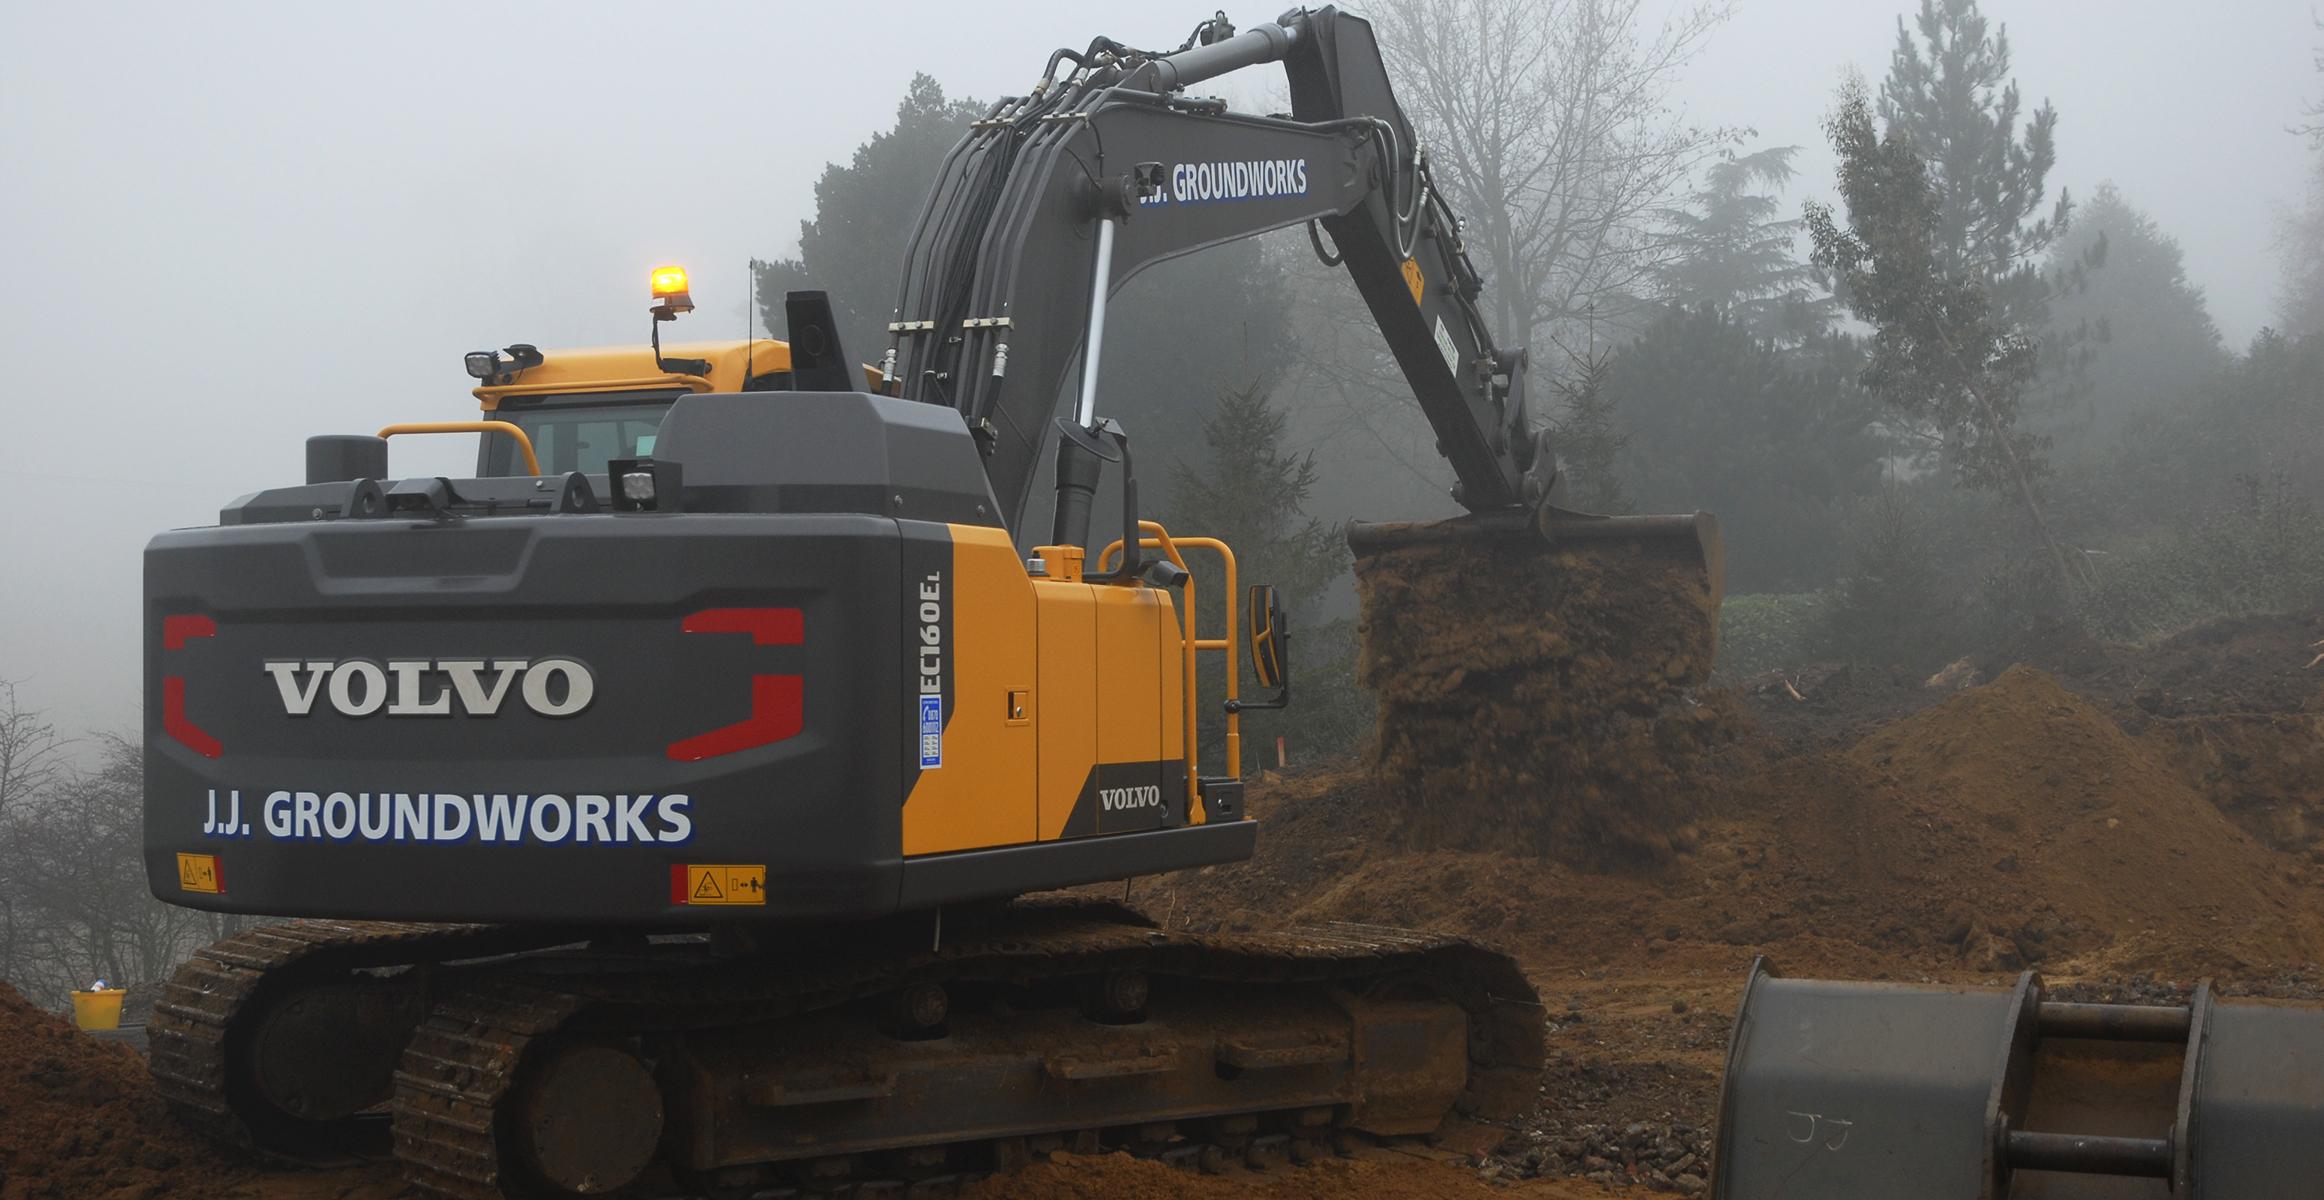 JJ Groundworks adds more Volvo excavators to the fleet